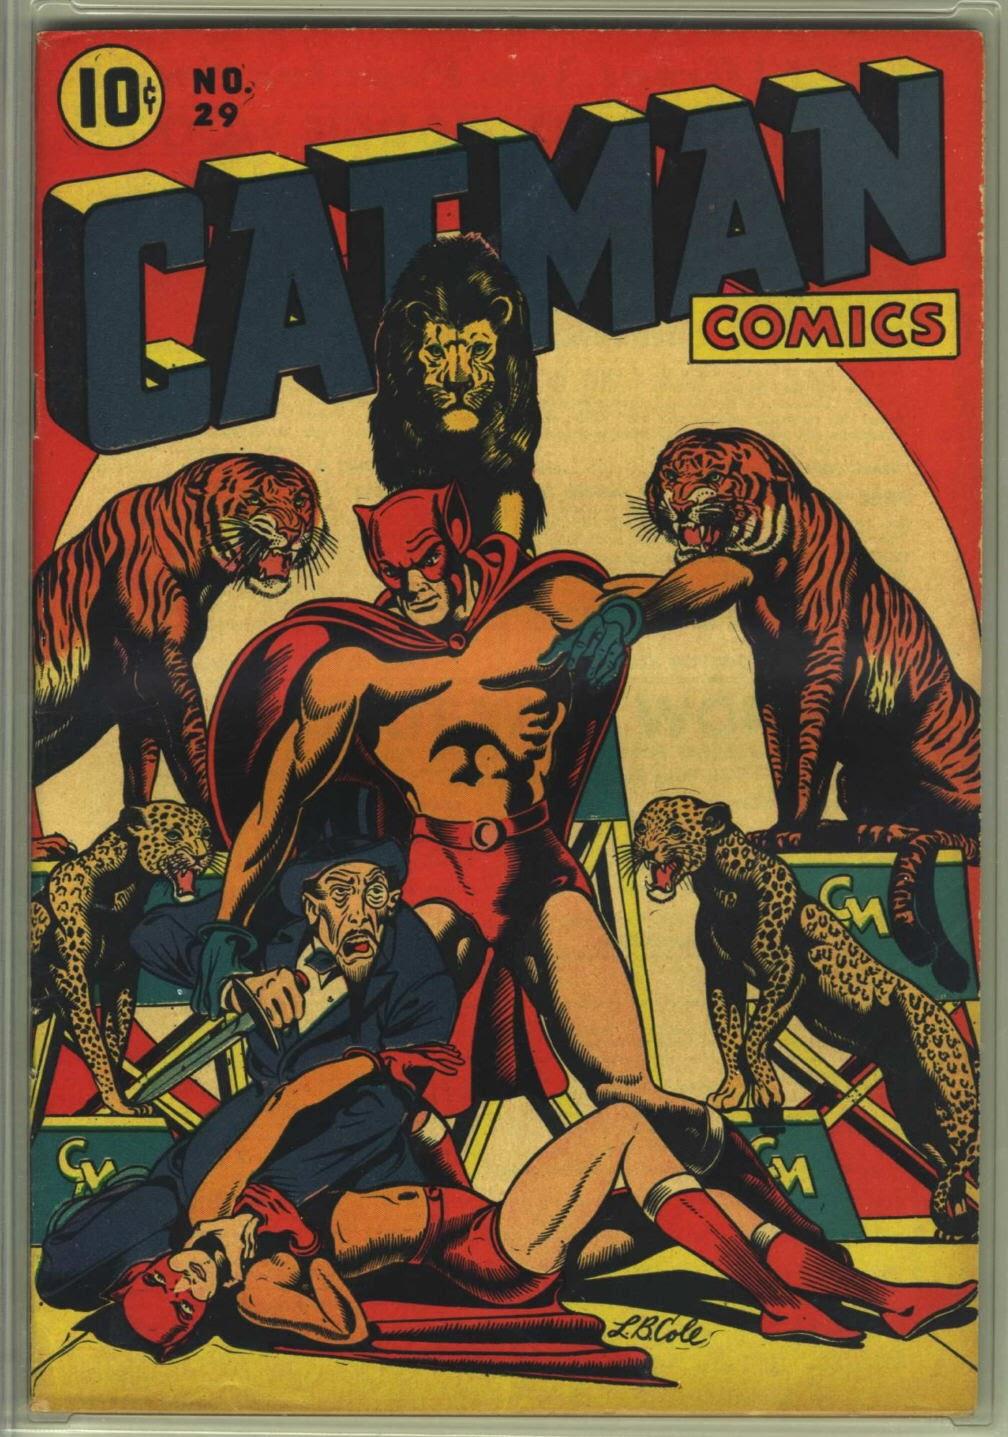 Cat-Man Comics 29 Page 1